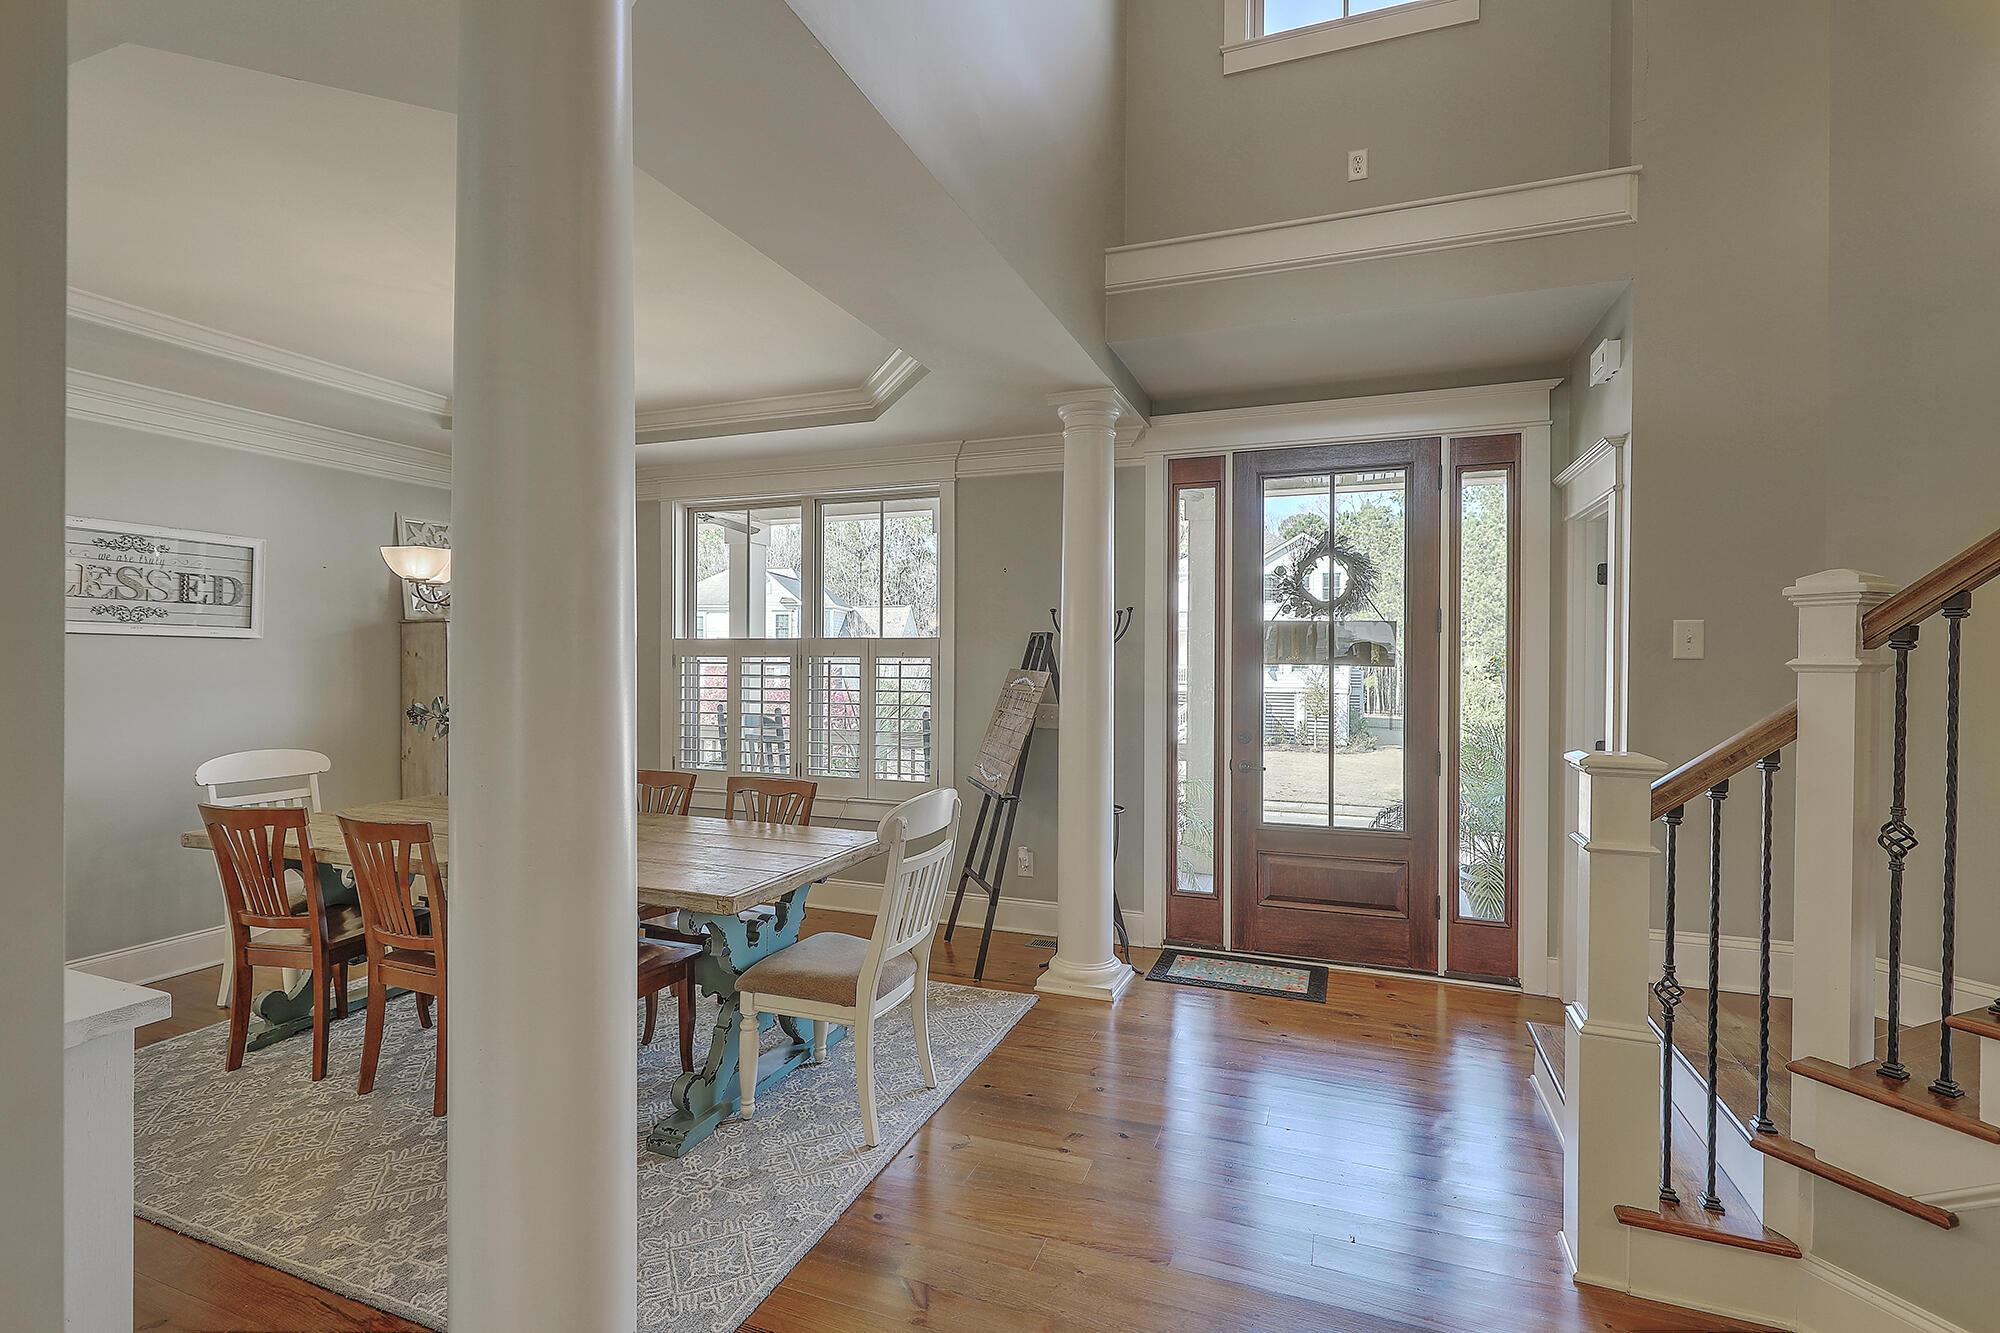 Beresford Creek Landing Homes For Sale - 1170 Rivershore, Charleston, SC - 0